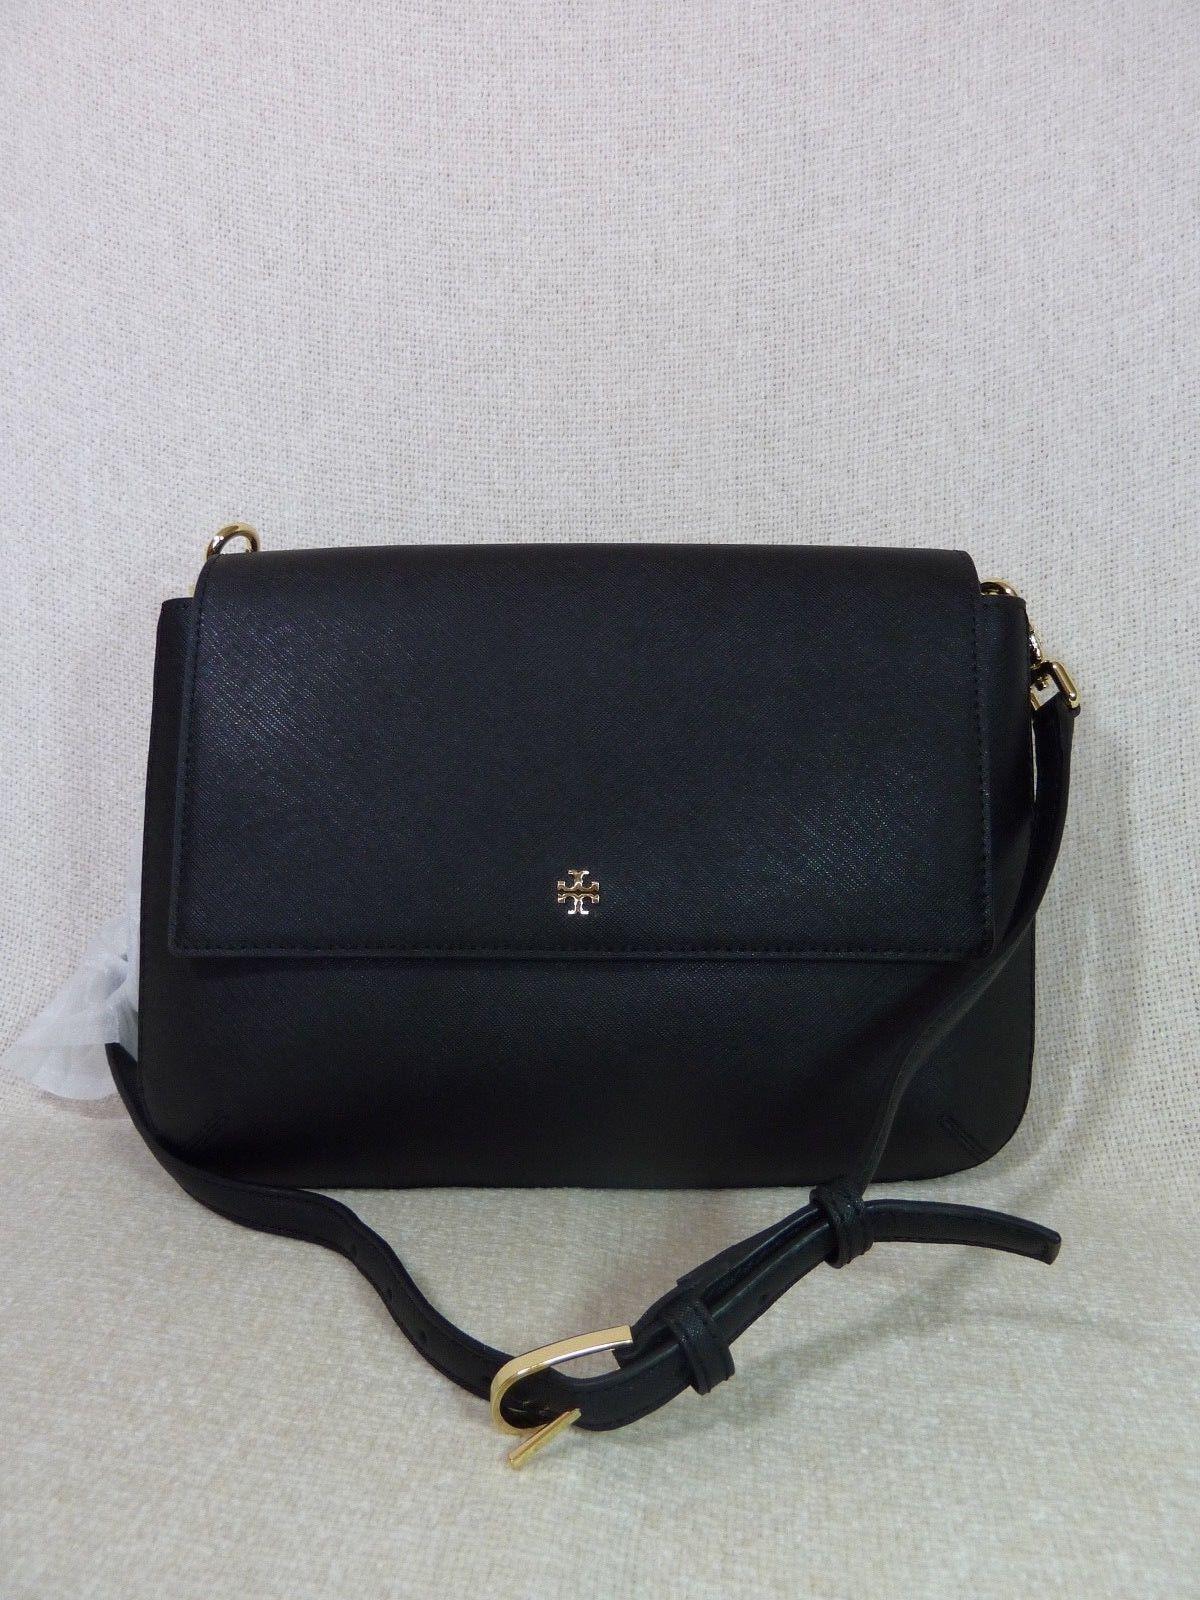 NWT Tory Burch Black Robinson Saffiano Combo Messenger Bag $450